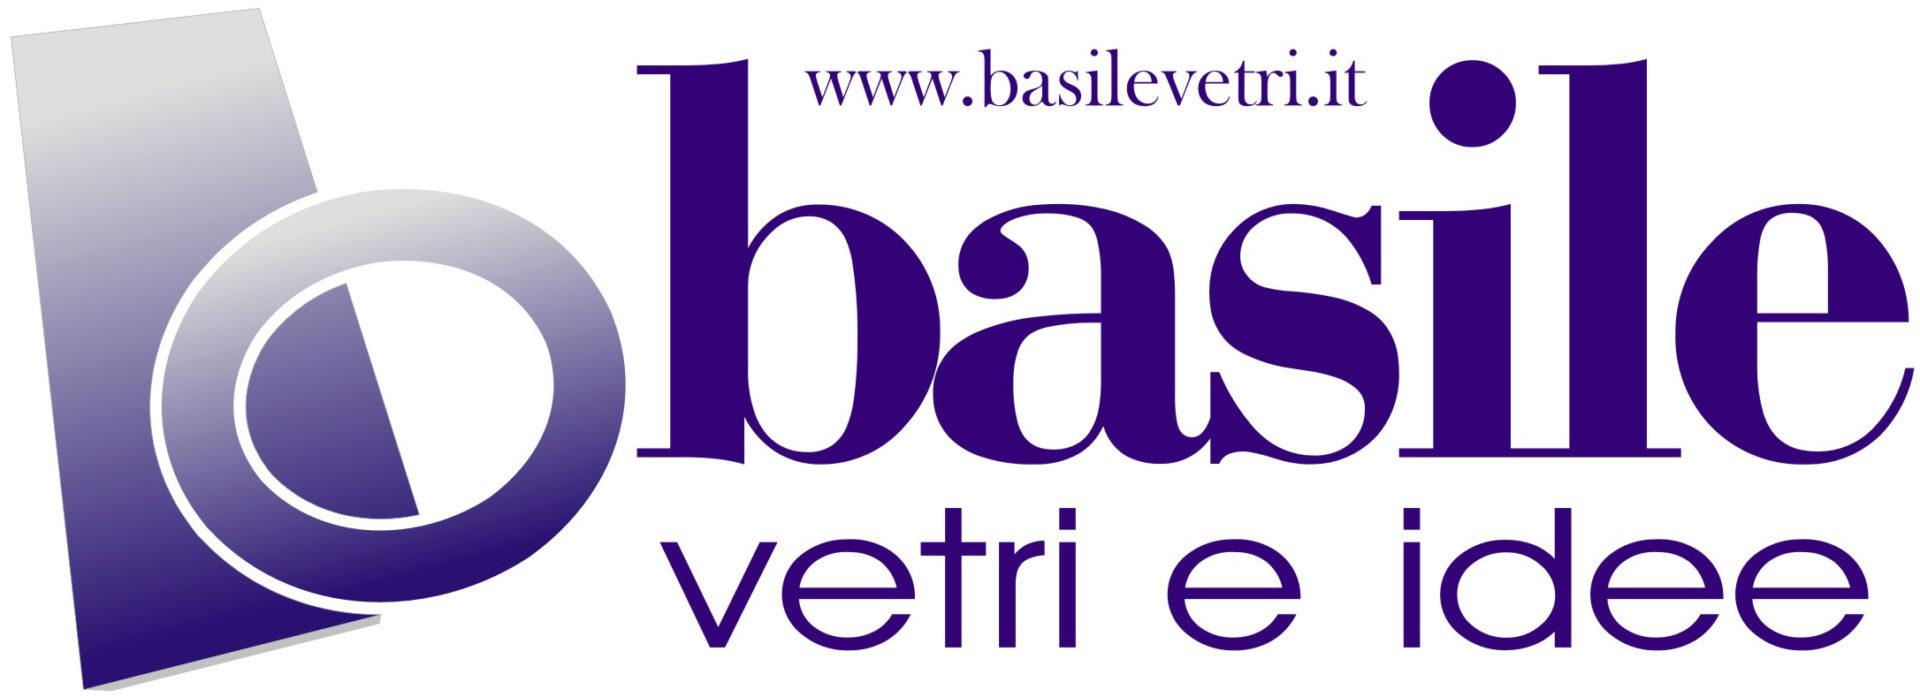 basilevetri